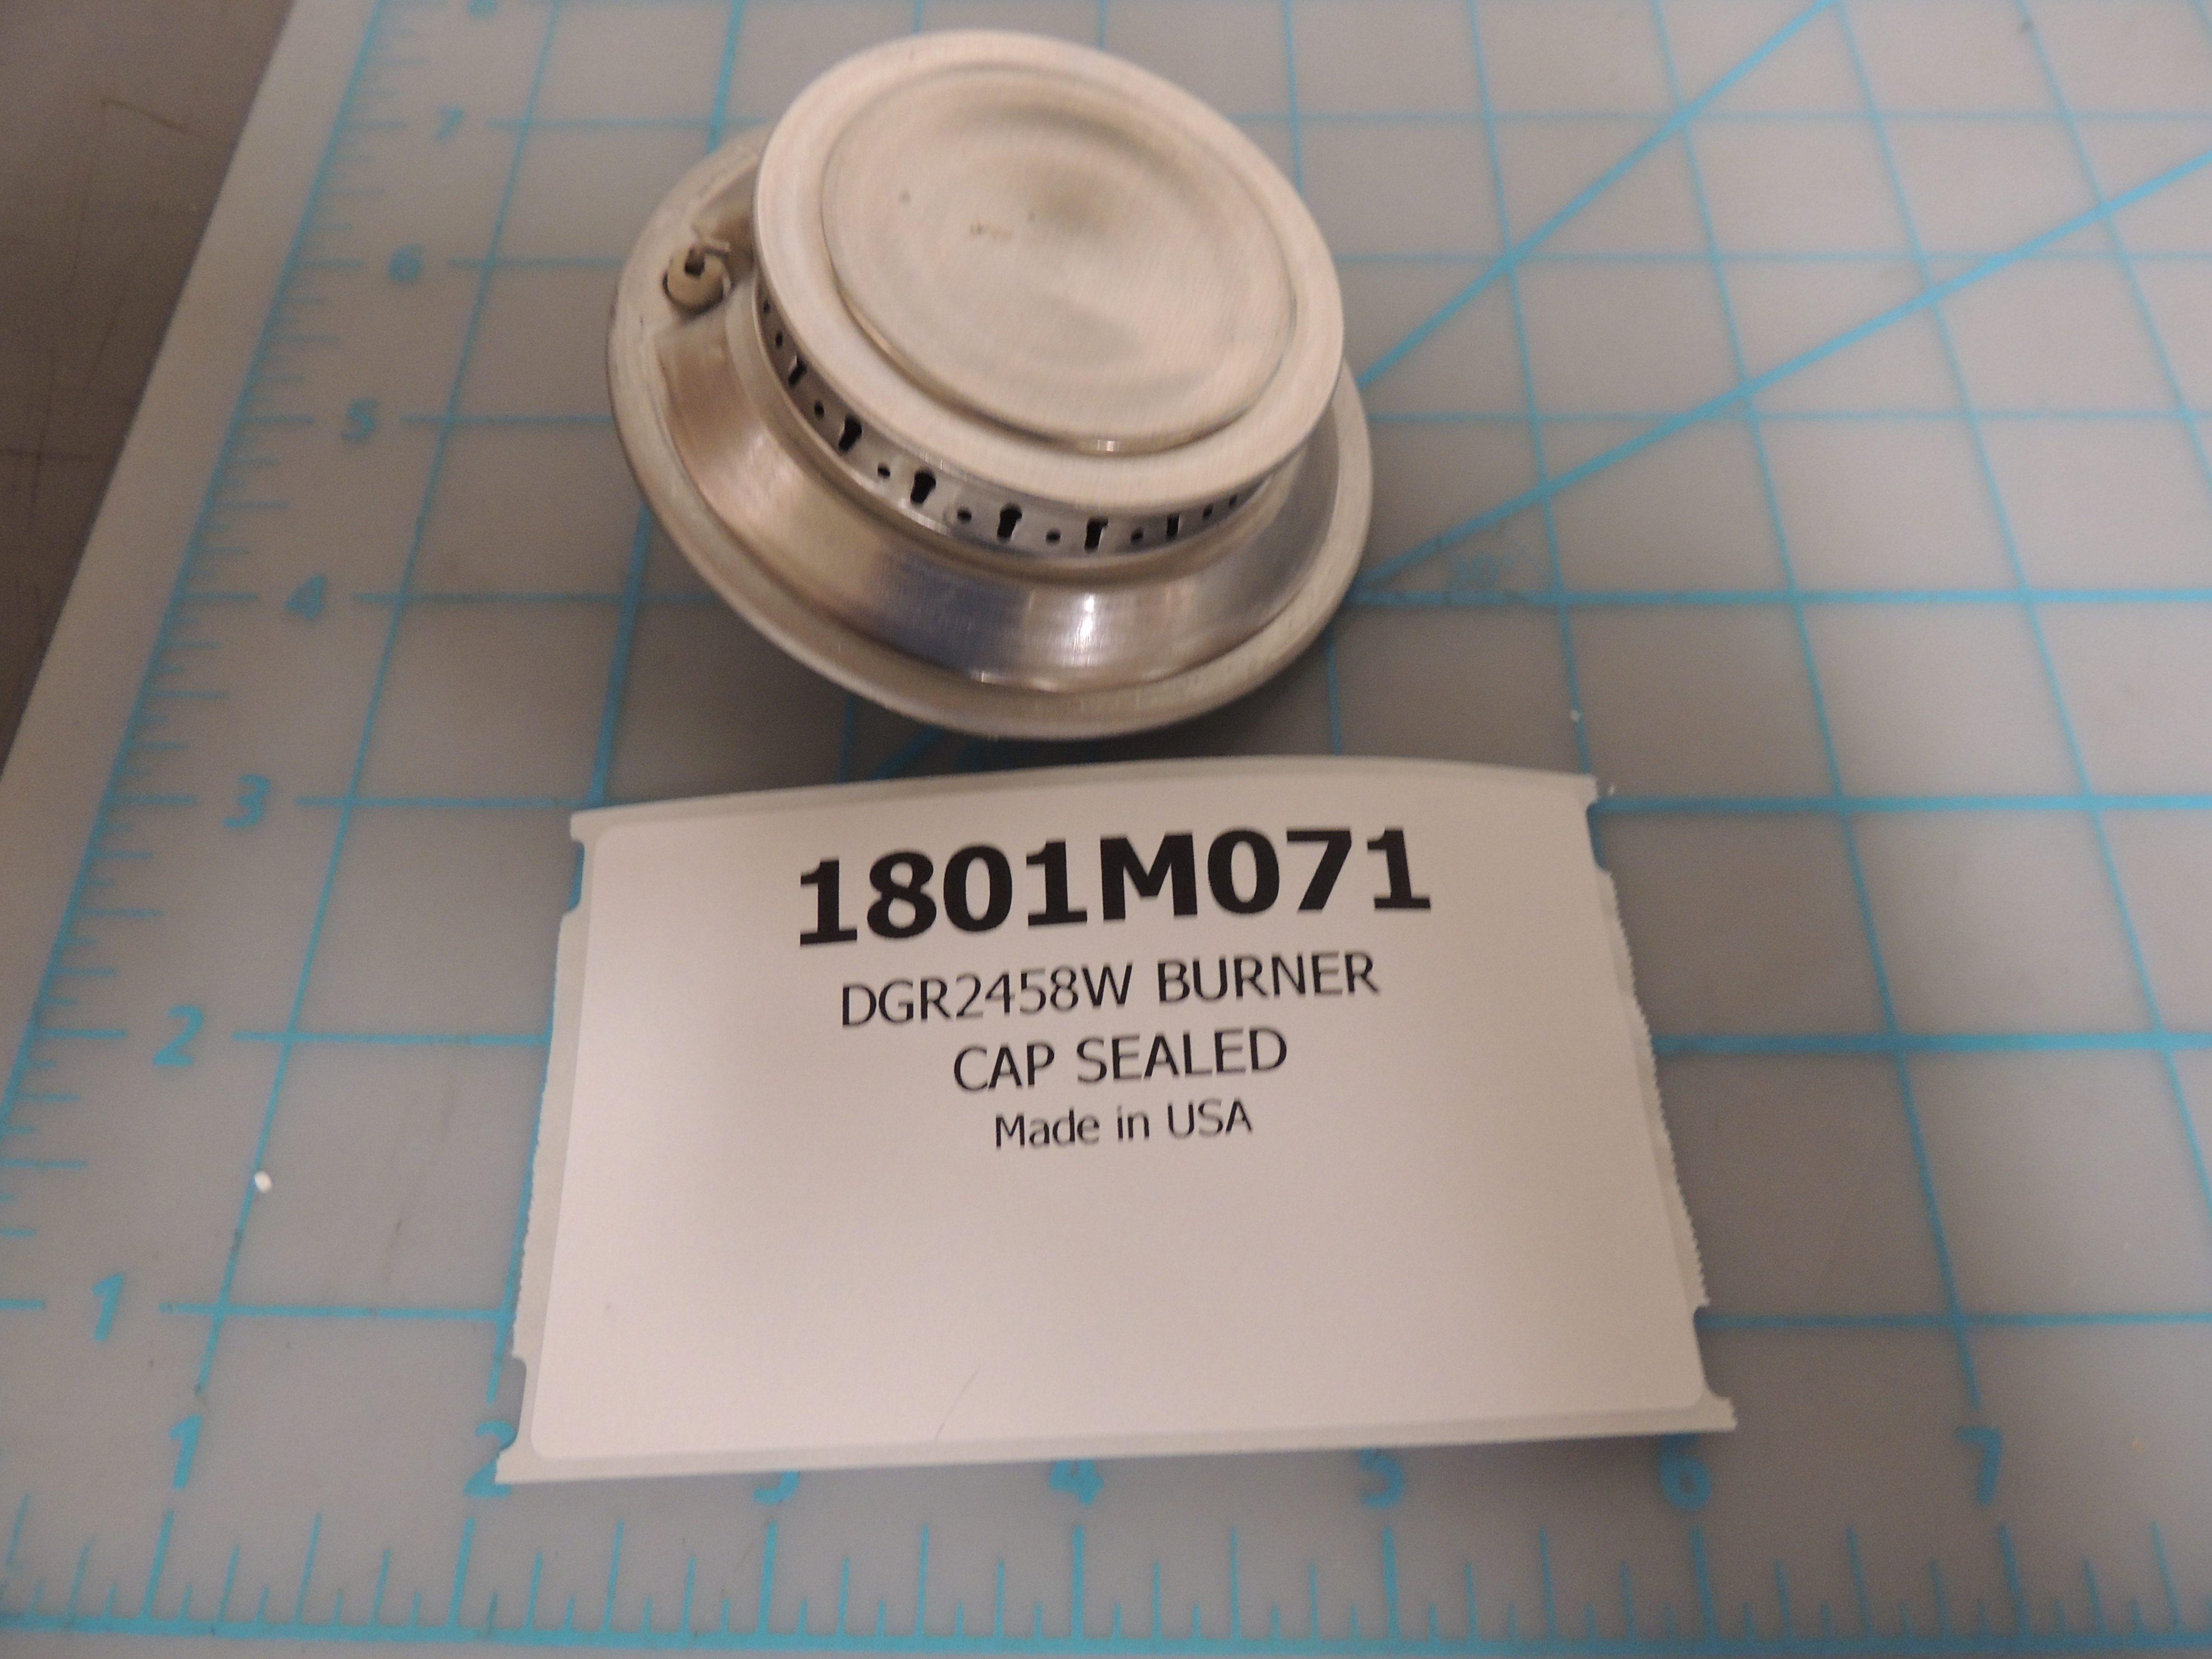 DGR2458W BURNER CAP SEALED